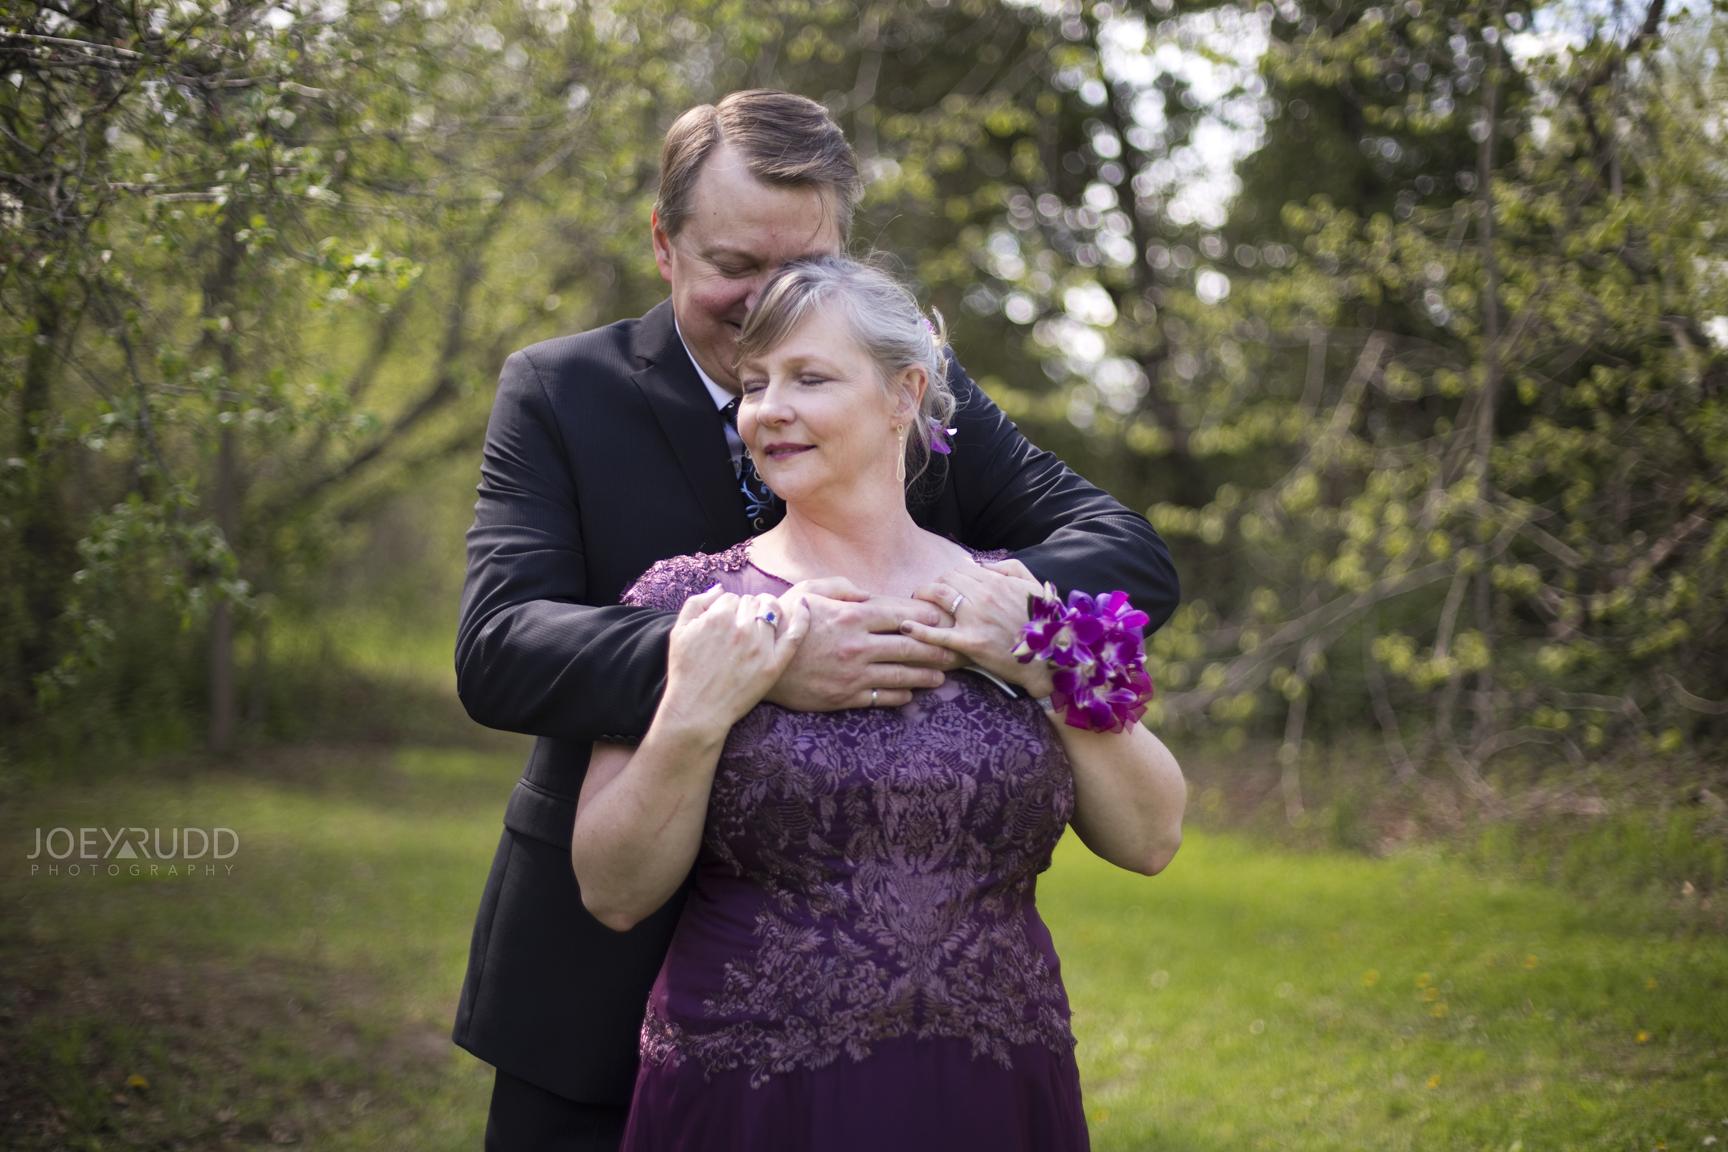 Elopement Session at Jabulani Vineyard by Joey Rudd Photography Ottawa Wedding Photographer Spring